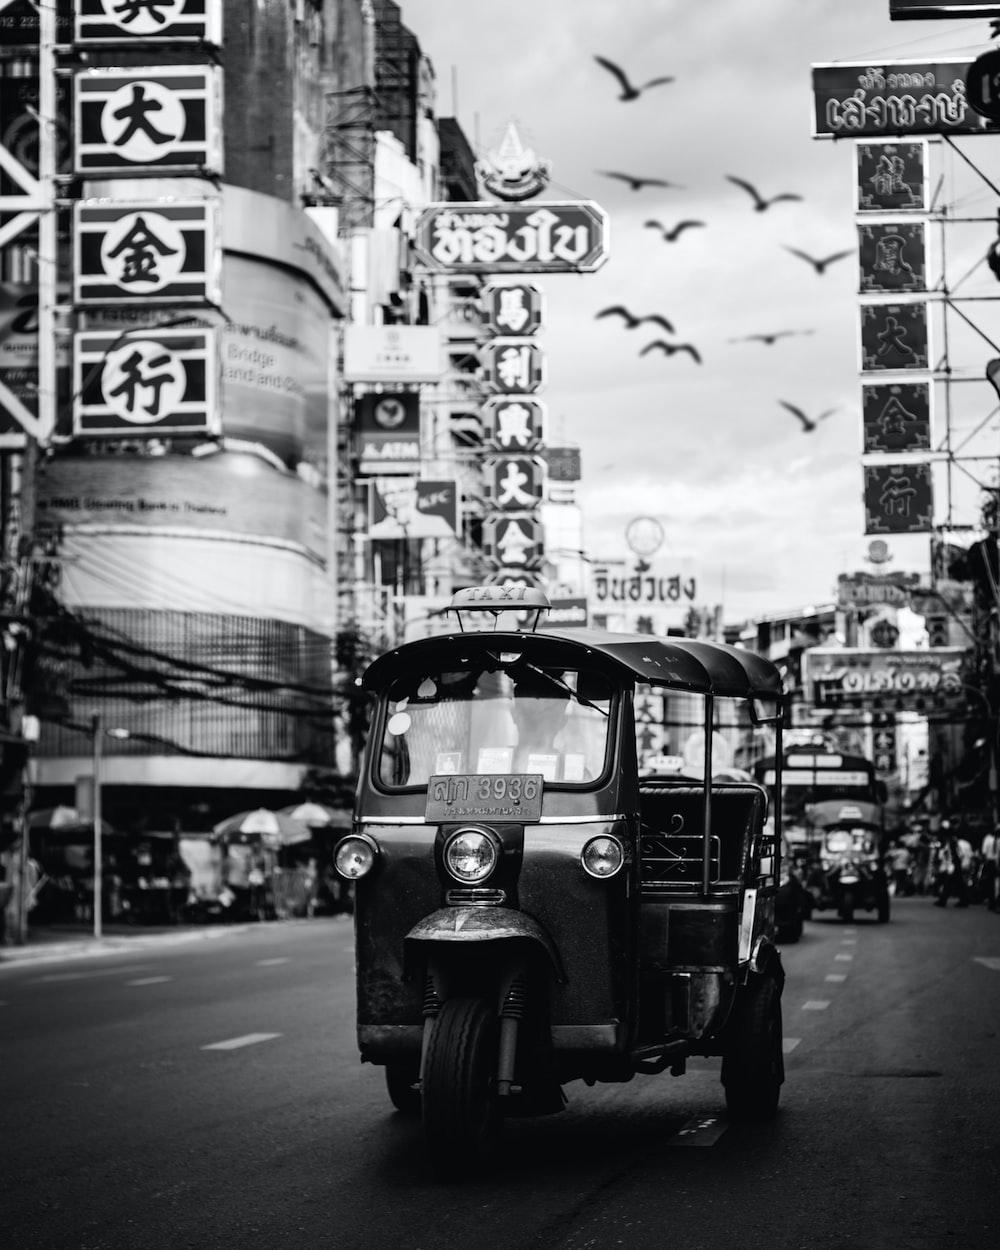 gray auto rickshaw on road